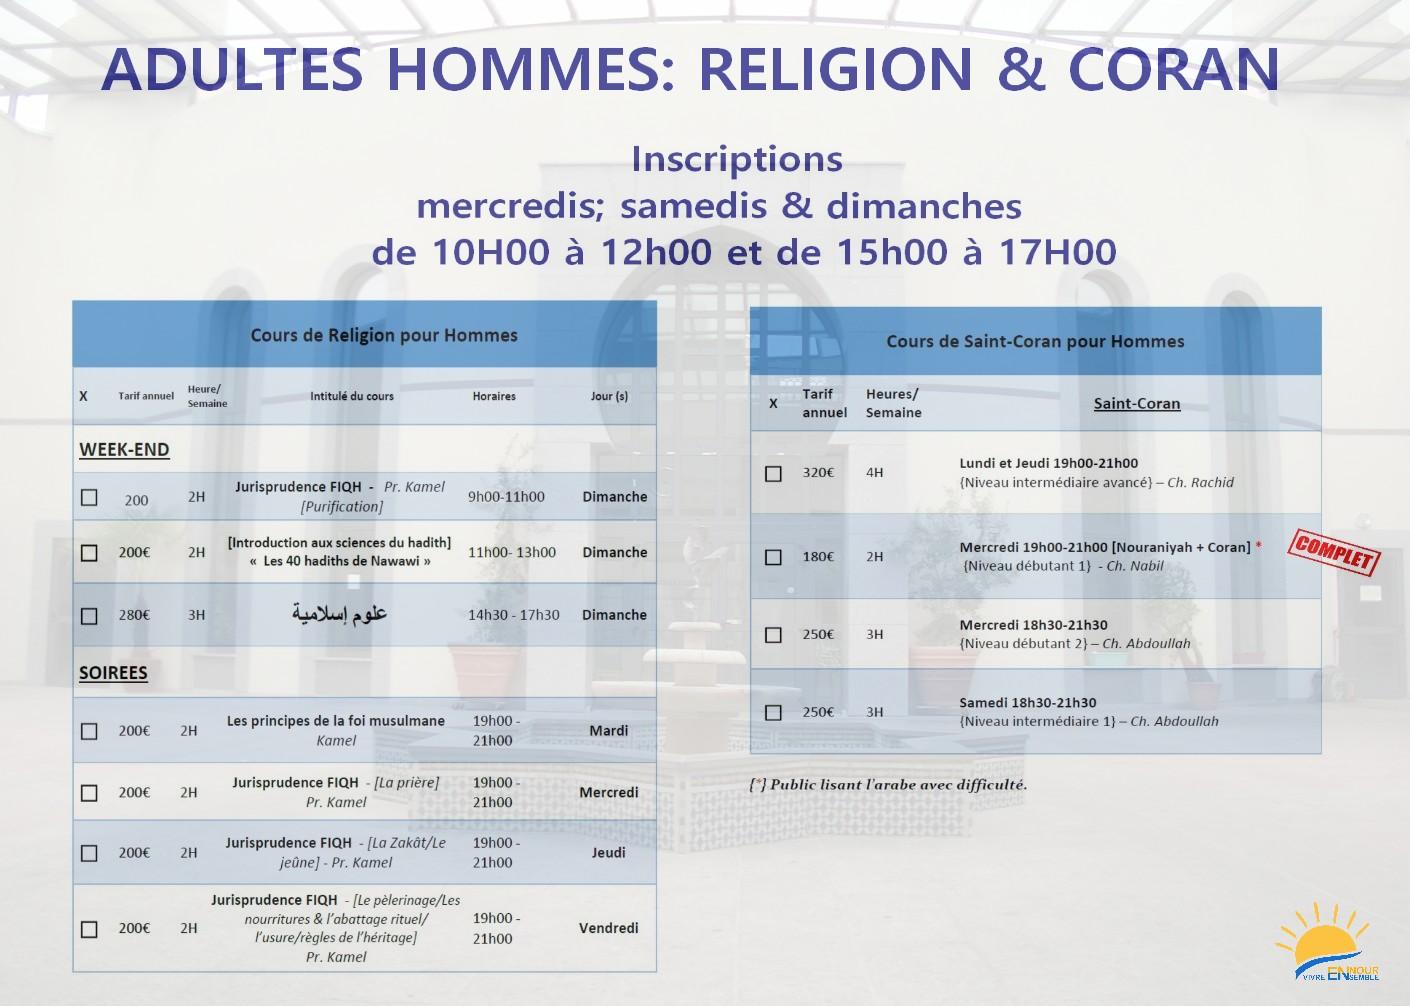 coran-et-religion-homme